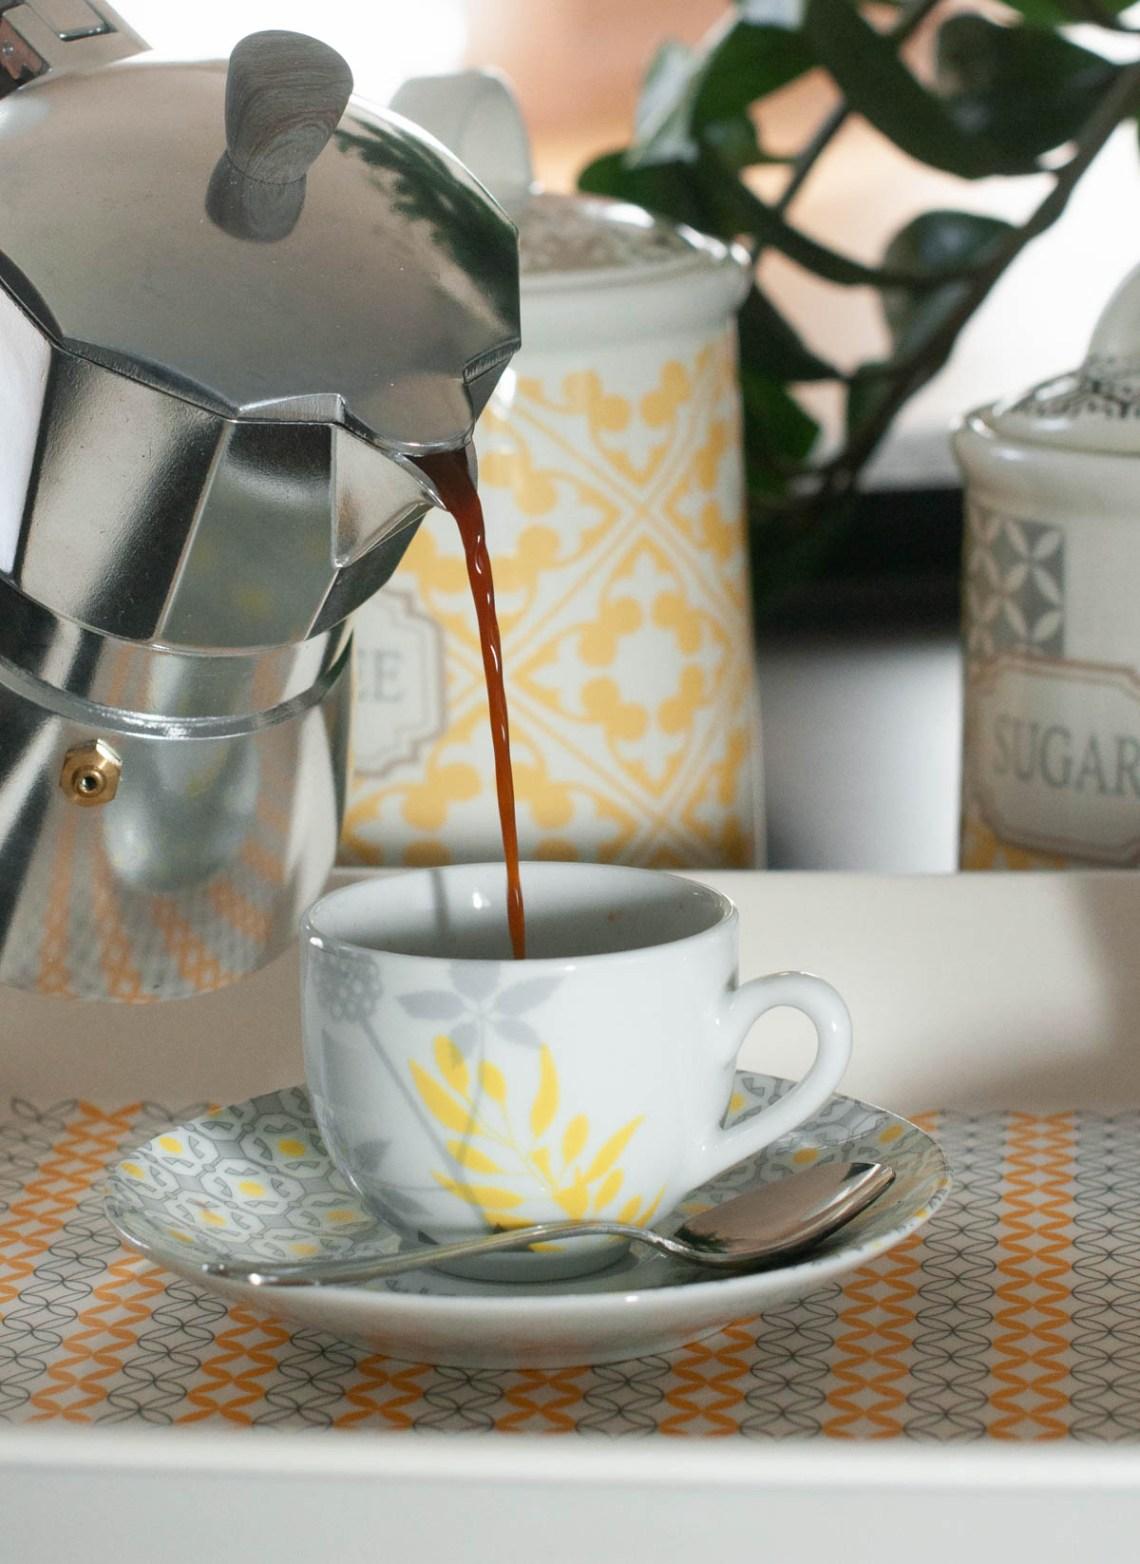 Tognana caffettiera